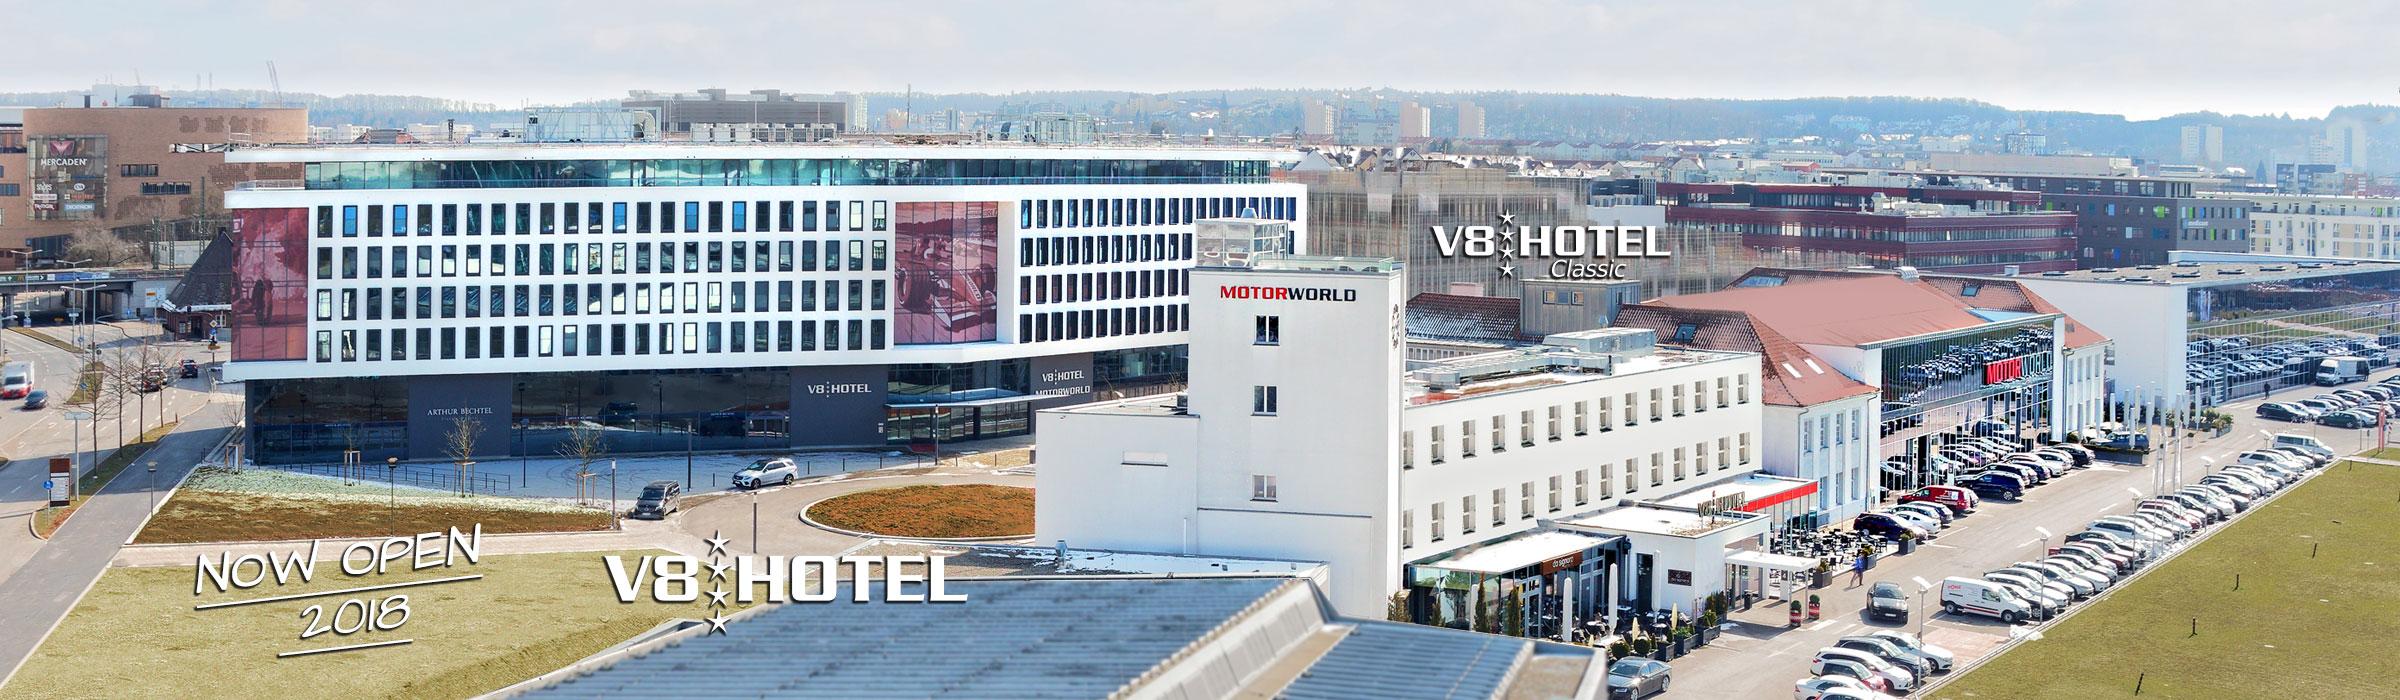 V8 hotel themen und designhotel motorworld stuttgart for Designhotel stuttgart